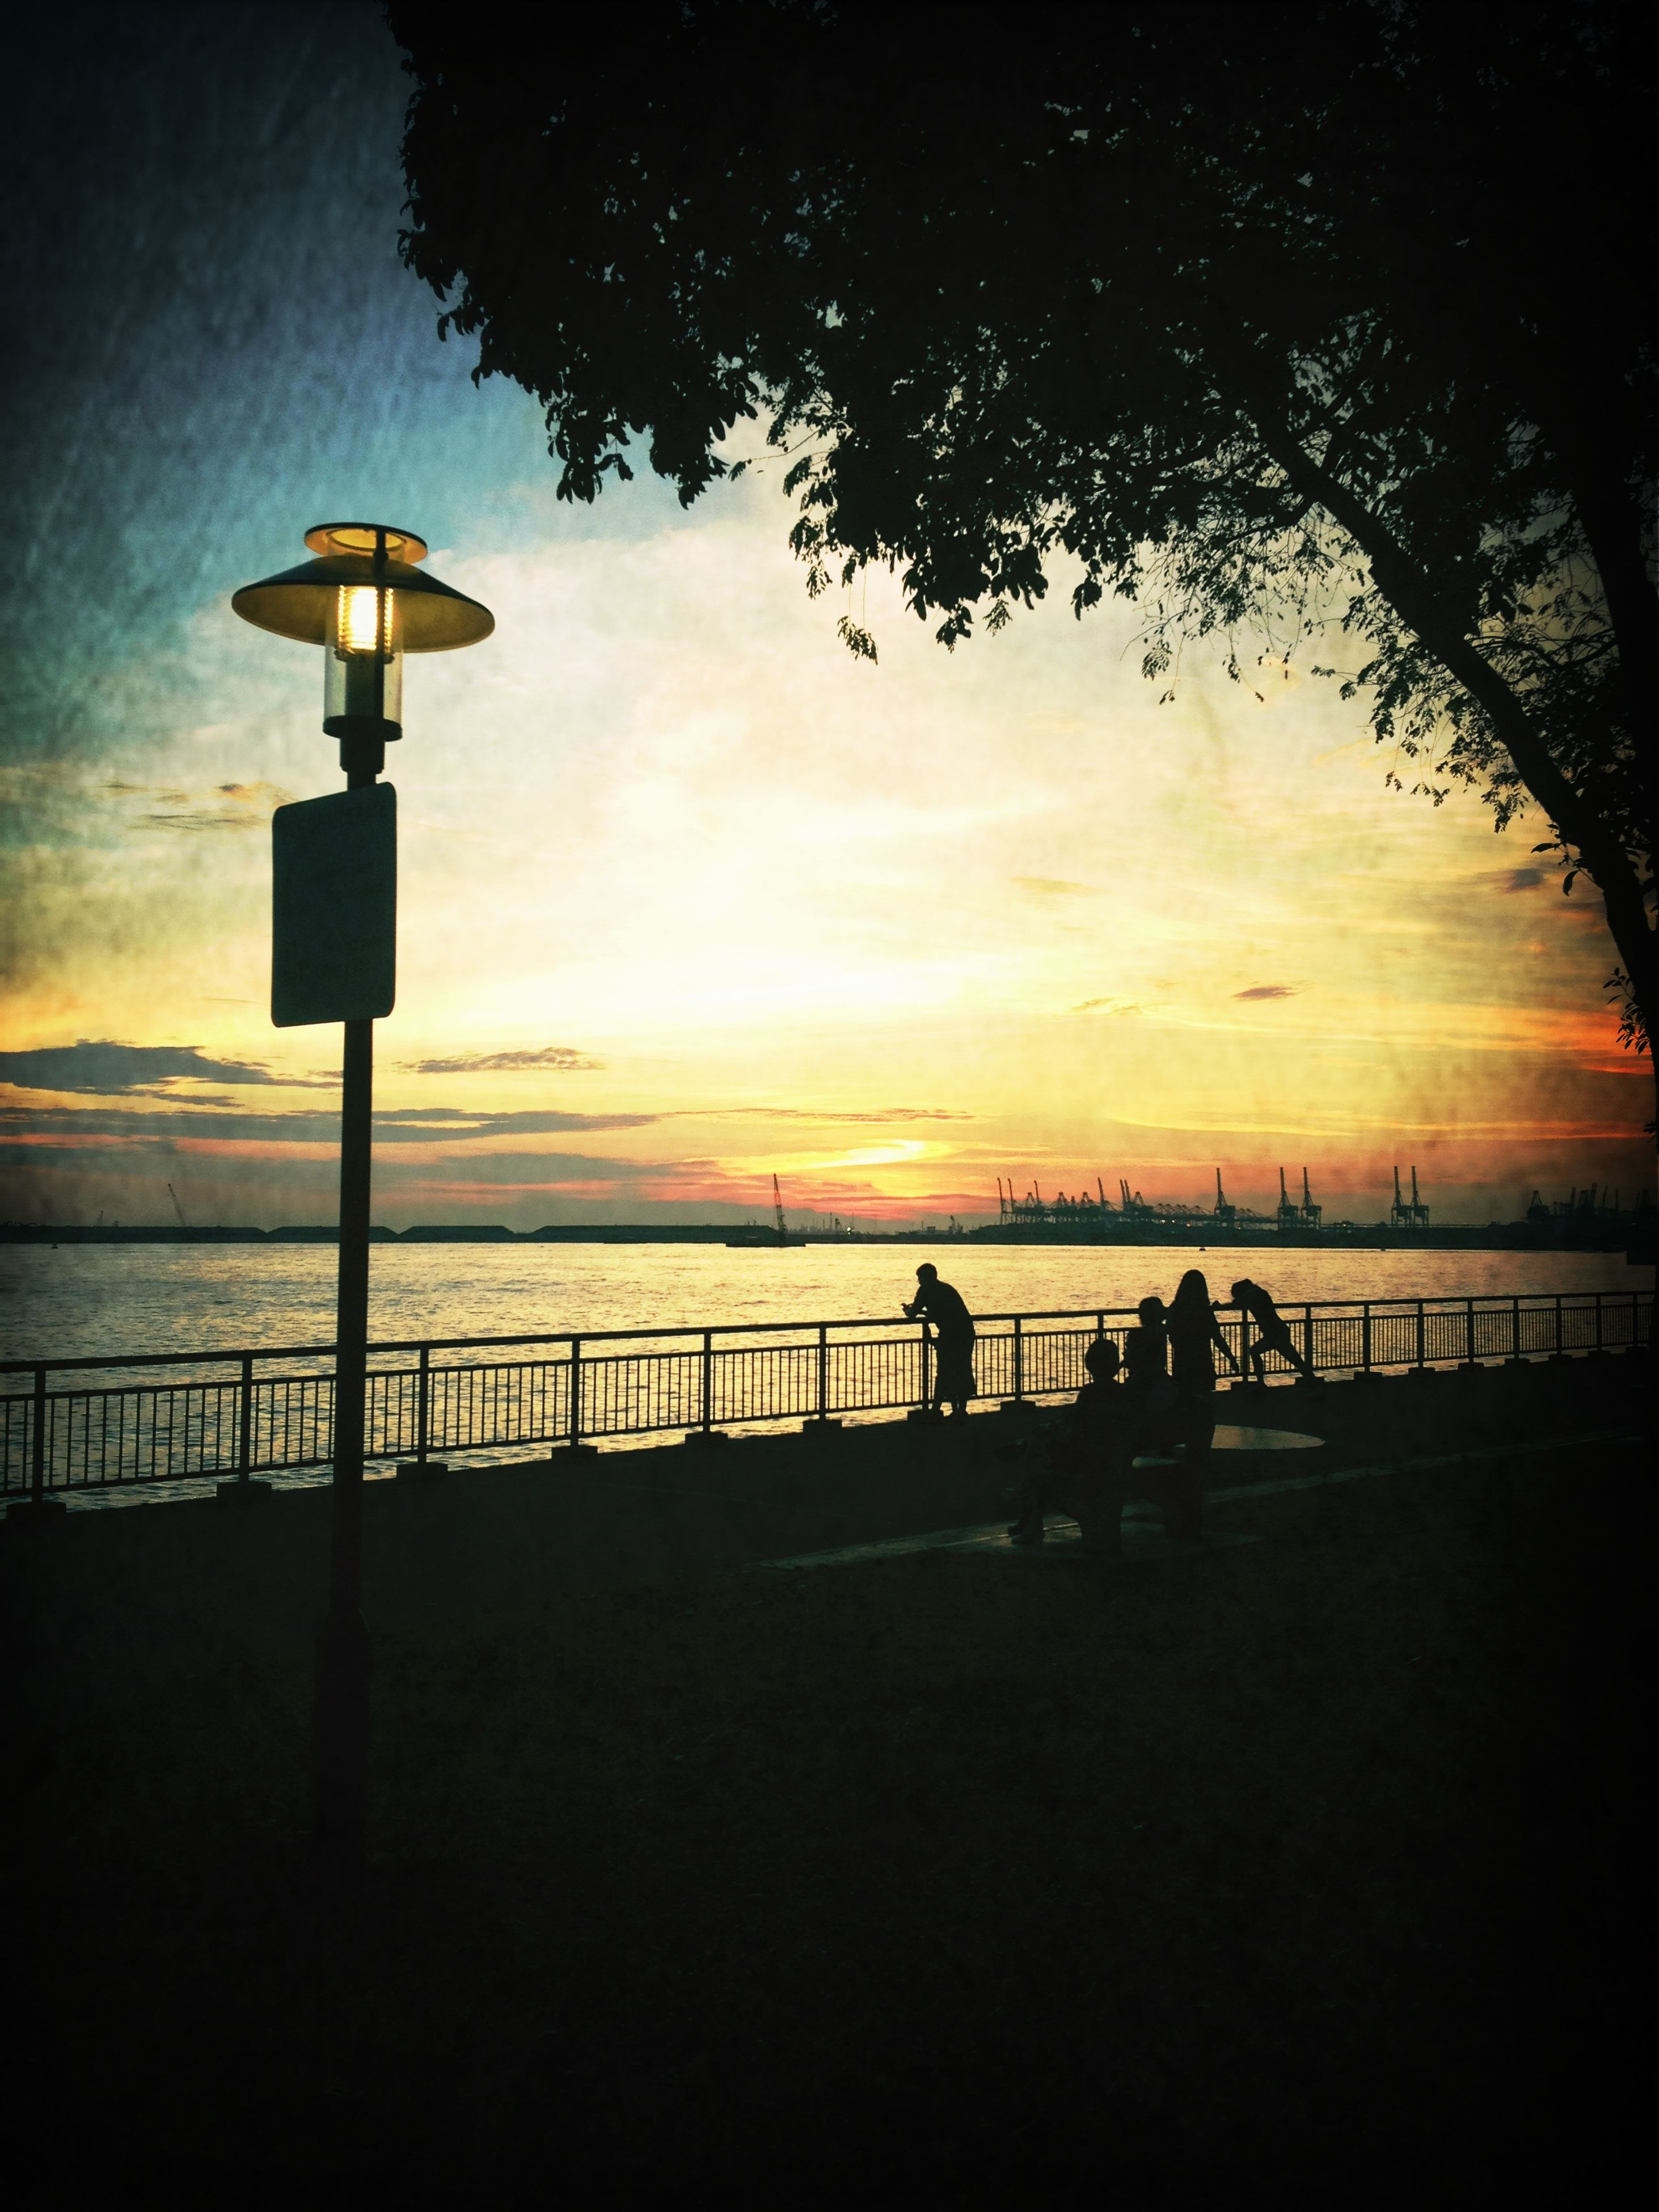 sunset, silhouette, sky, water, scenics, tranquility, sea, tranquil scene, beauty in nature, orange color, street light, railing, nature, idyllic, horizon over water, dusk, built structure, cloud - sky, lighting equipment, sun